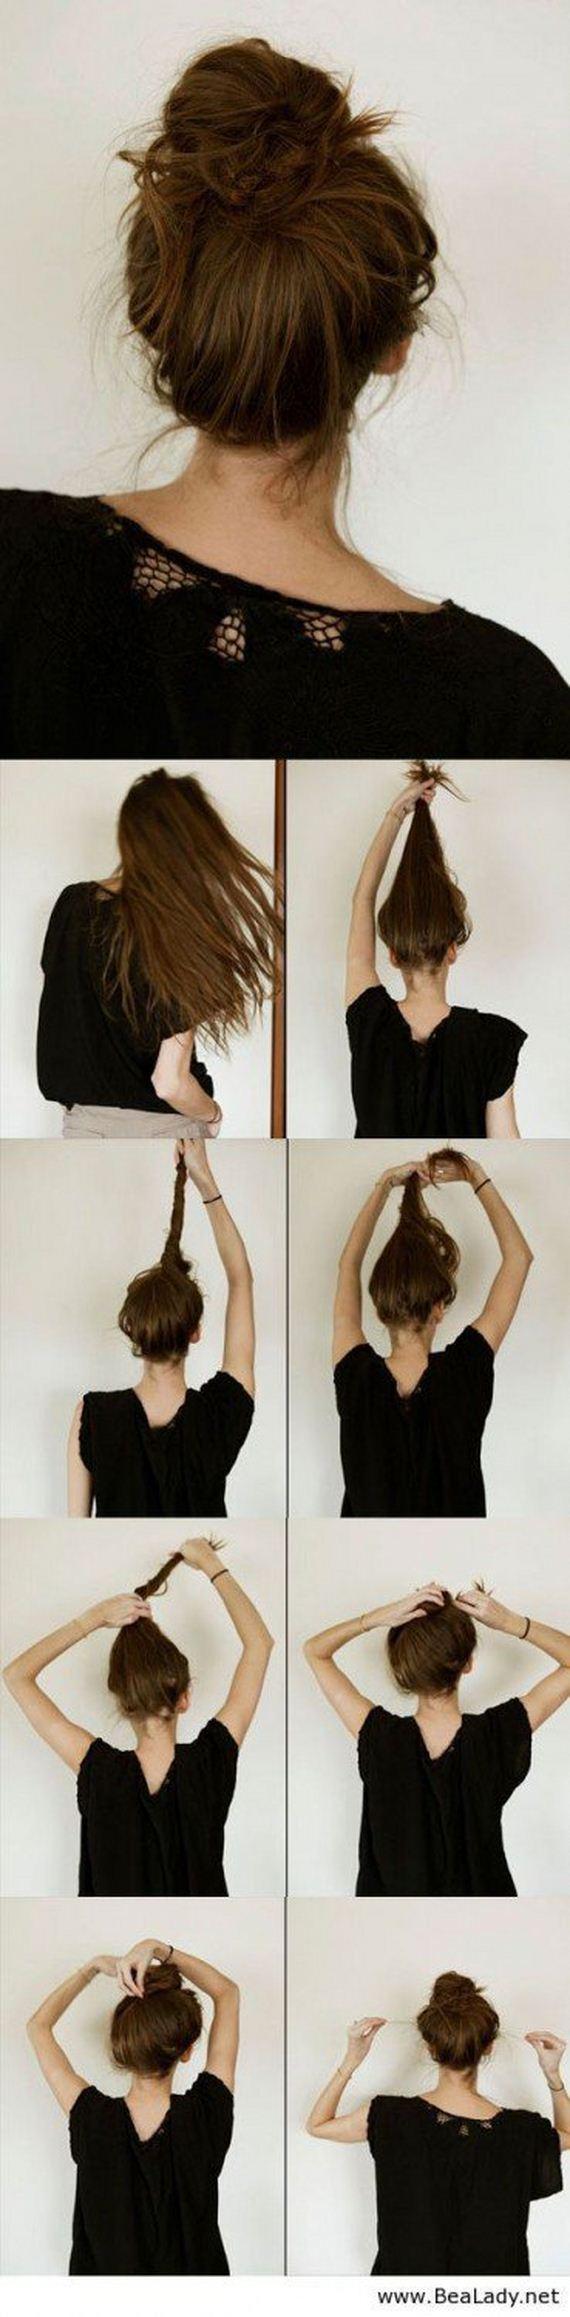 08-DIY-Hairstyles-for-Long-Hair